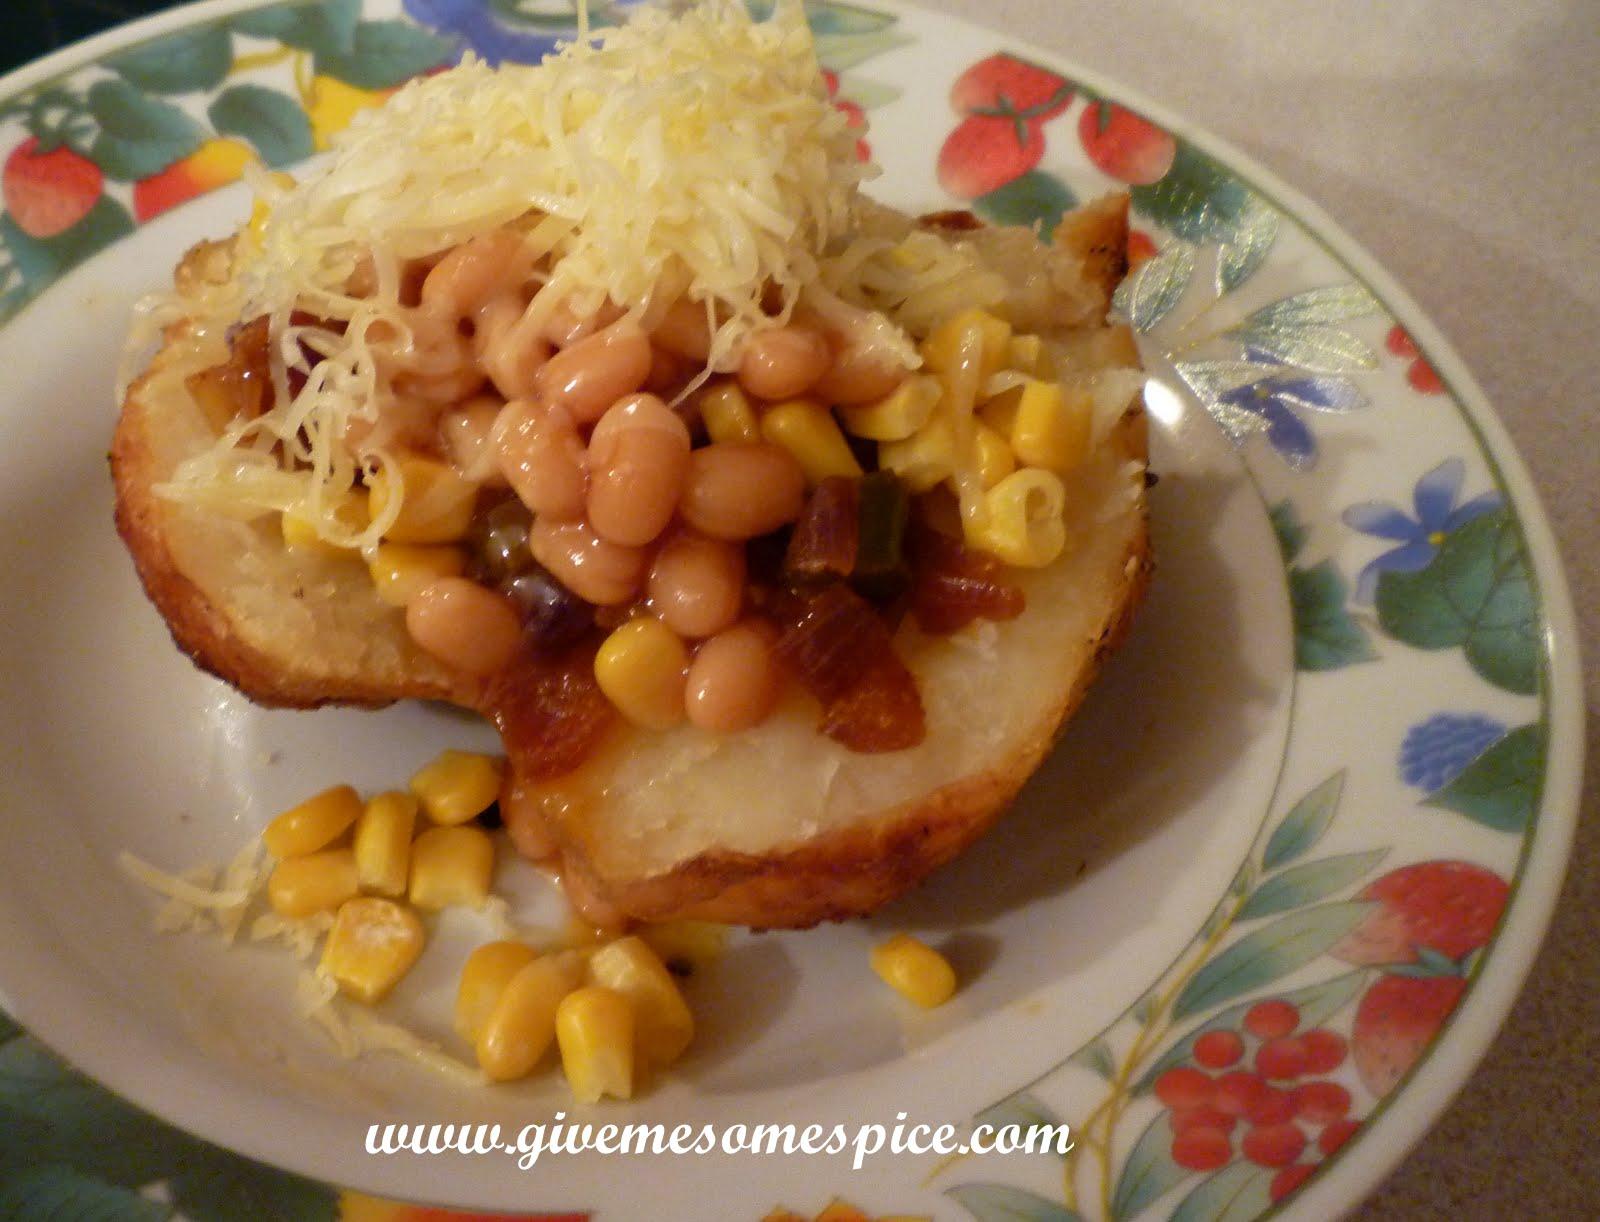 Jacket Potatoes With A Bit Of Desi Jhatka Authentic Vegetarian